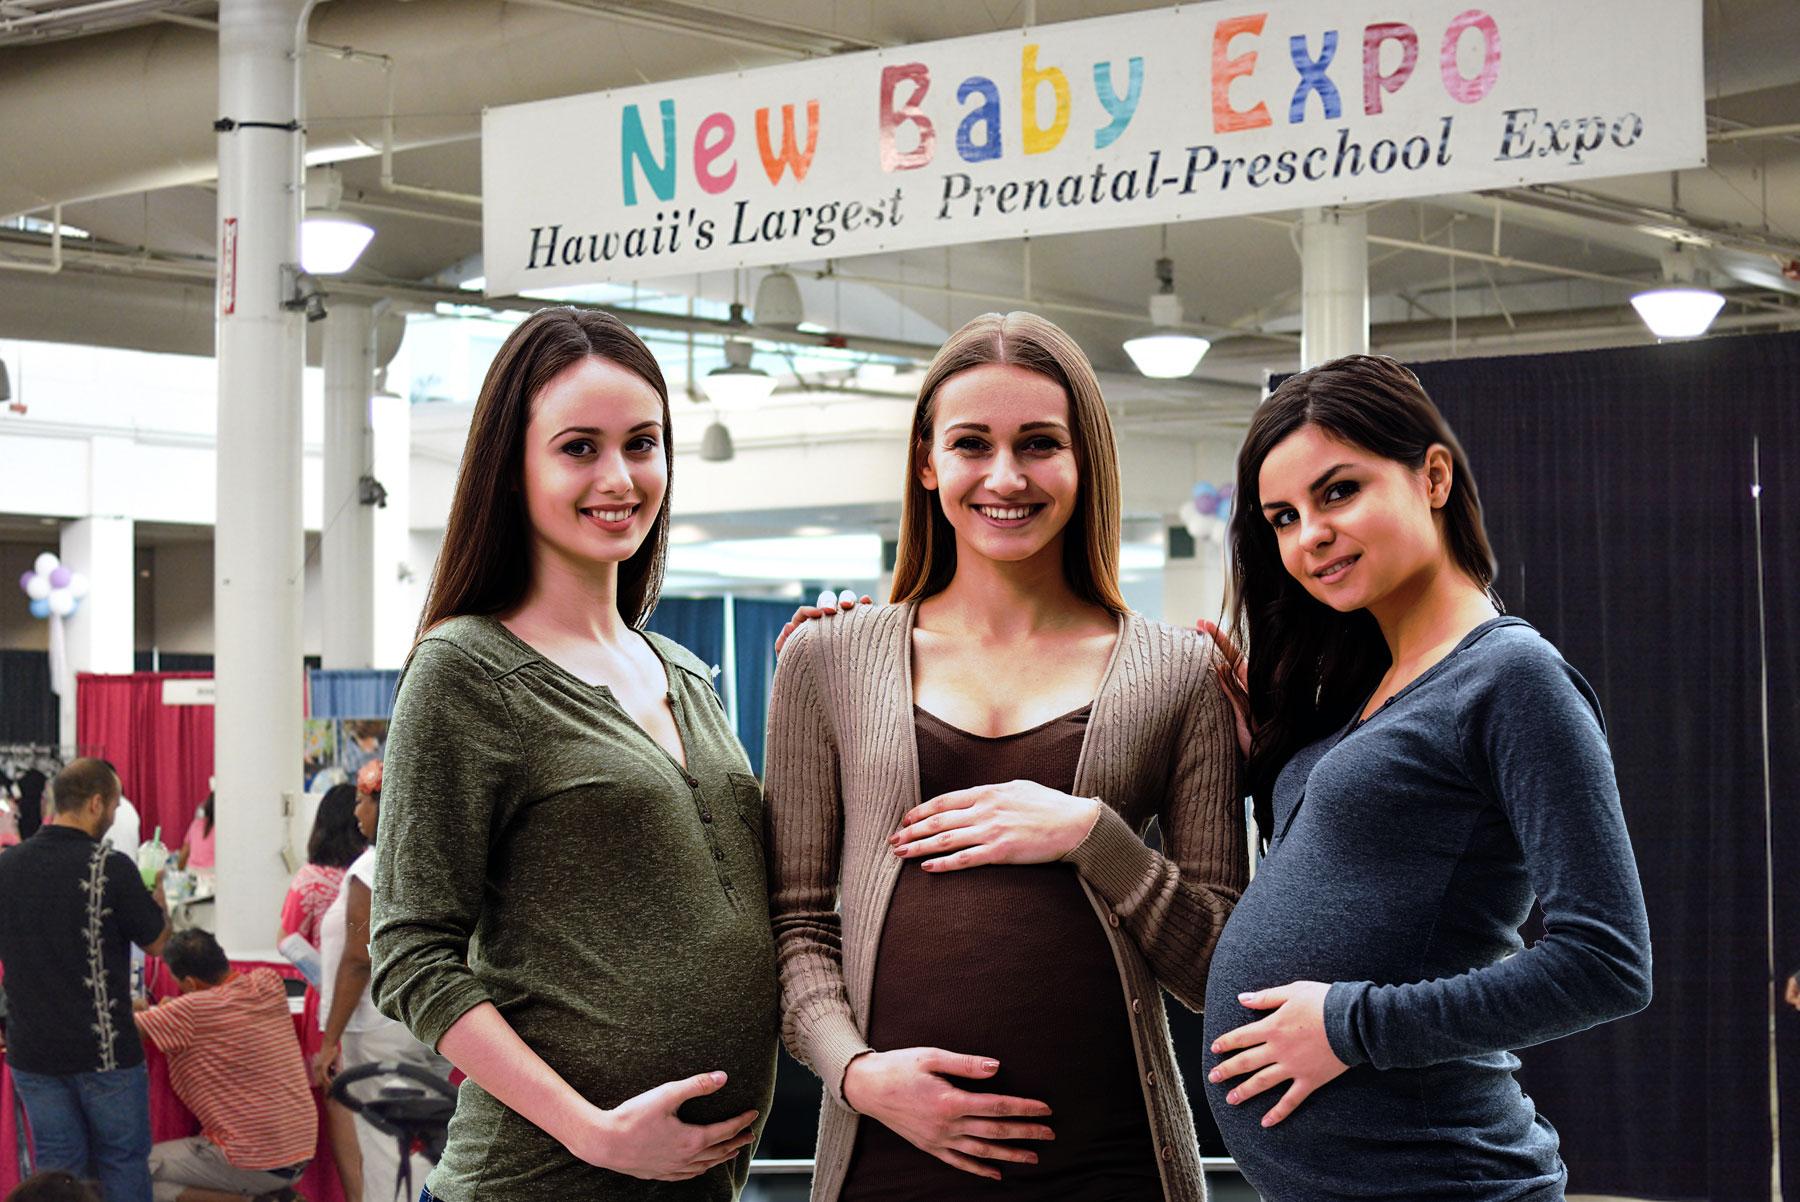 New Baby Expo - Happy Hapai Moms